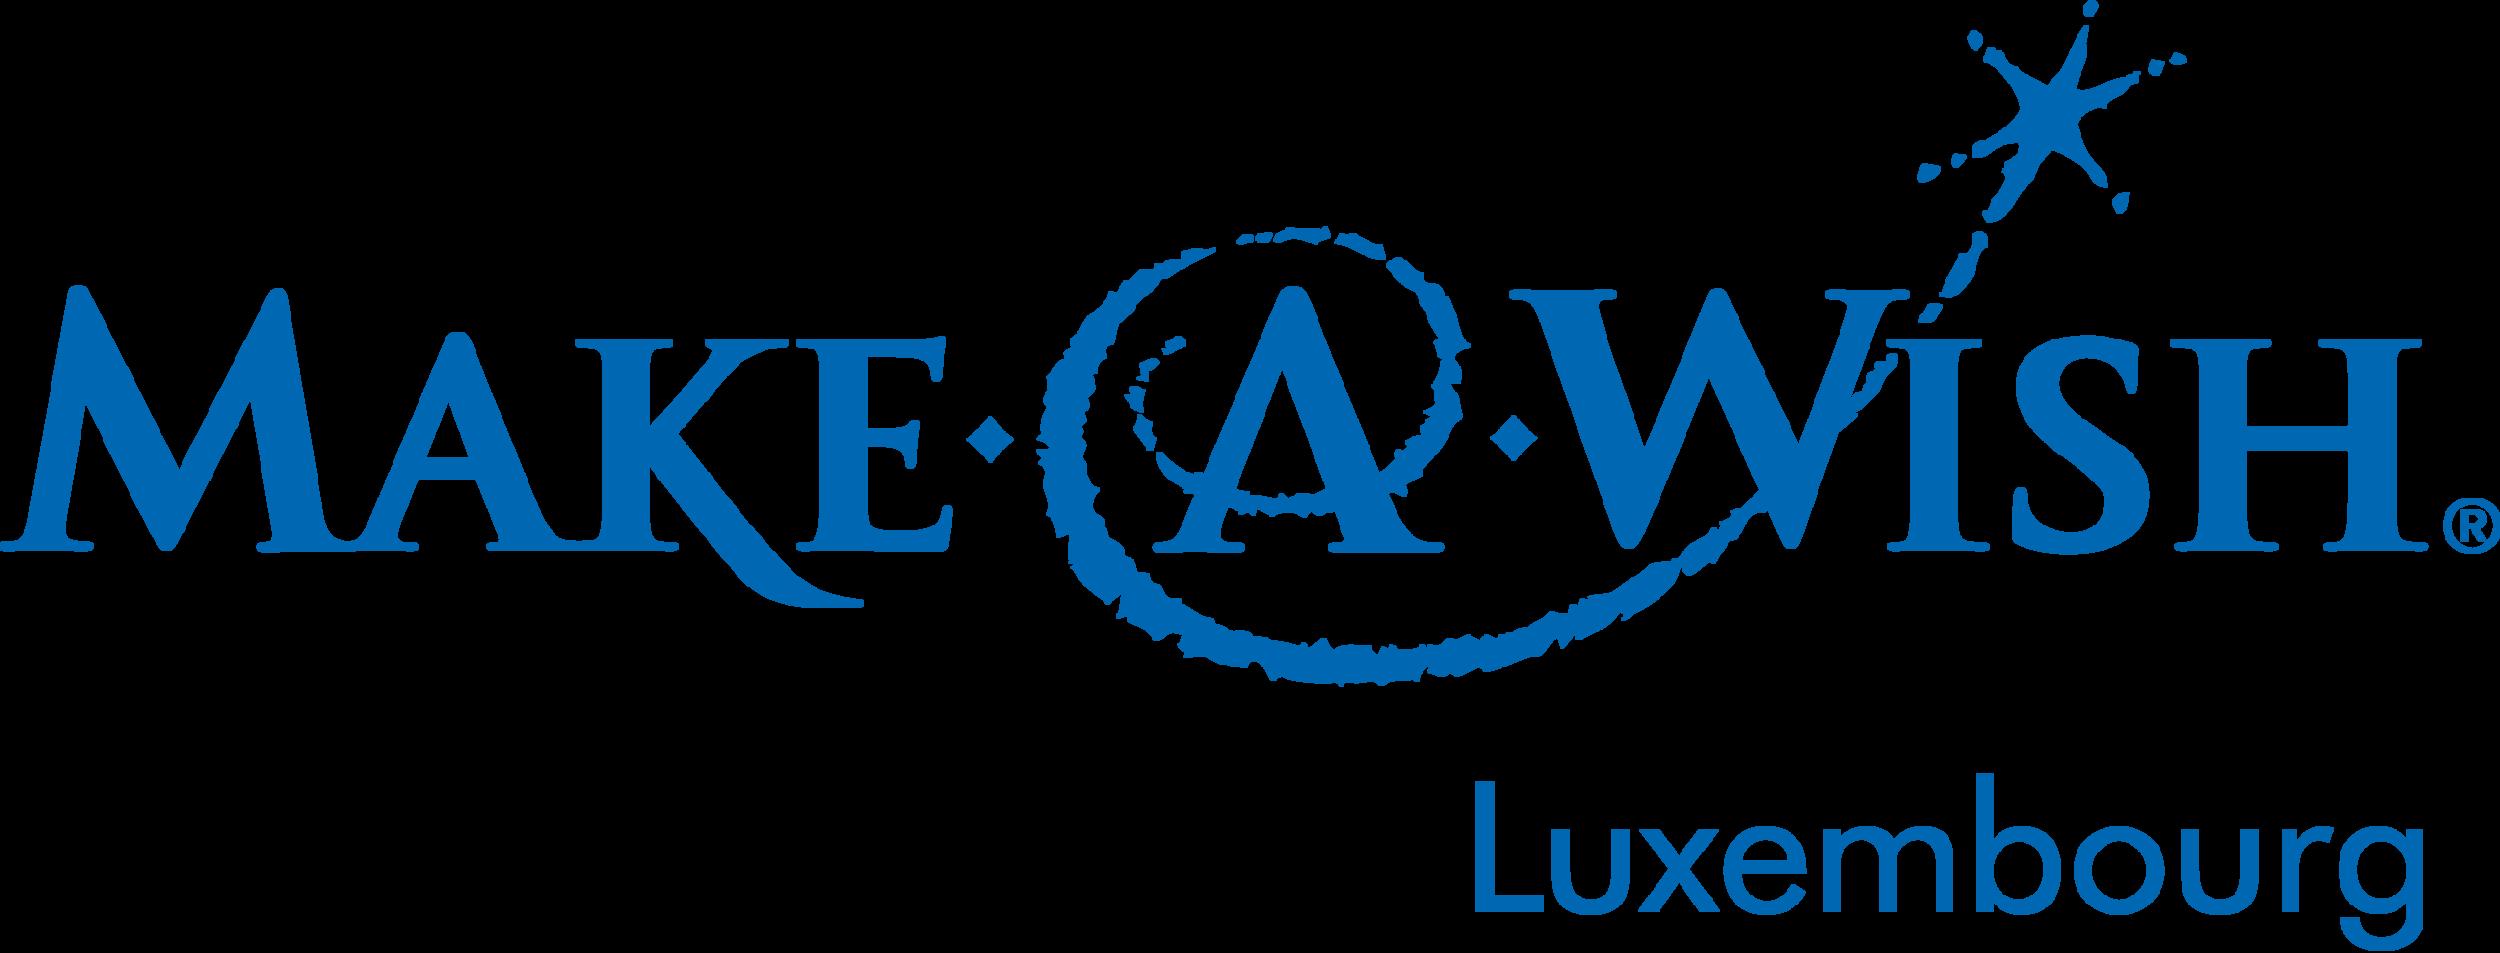 Make-A-Wish Luxembourg Logo